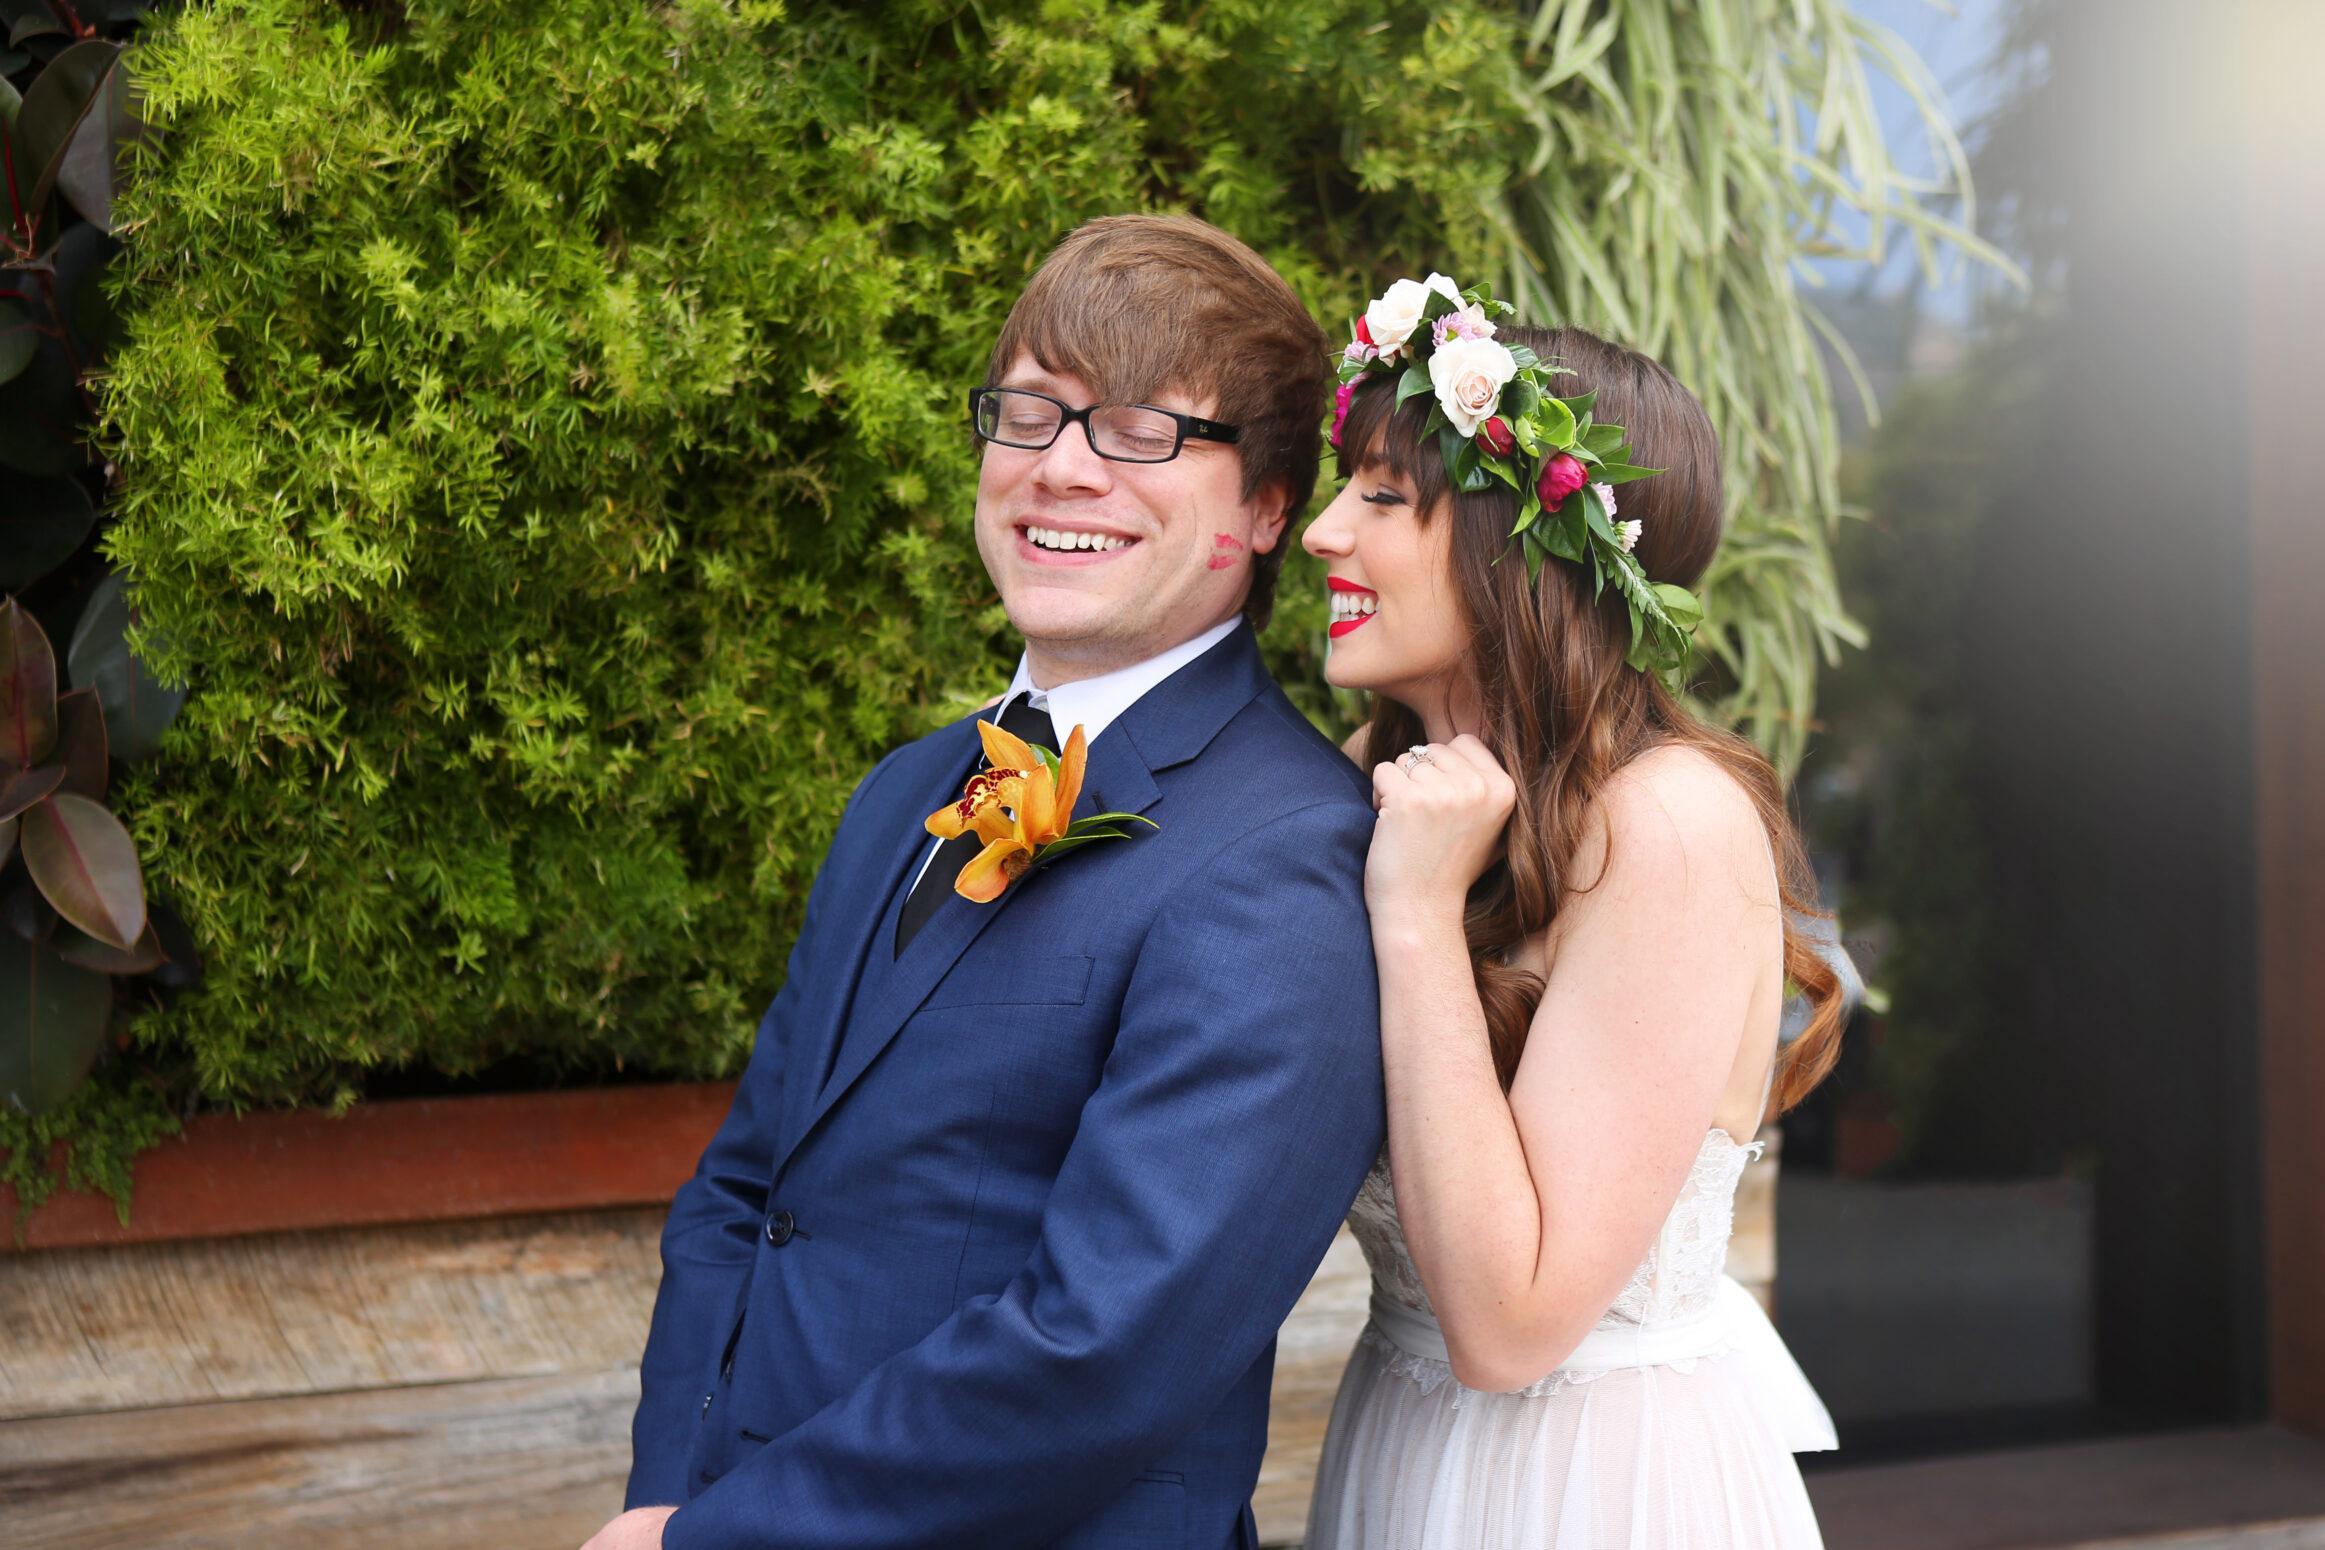 Laguna Beach Bride and Groom Colorful wedding Bride and Groom kiss